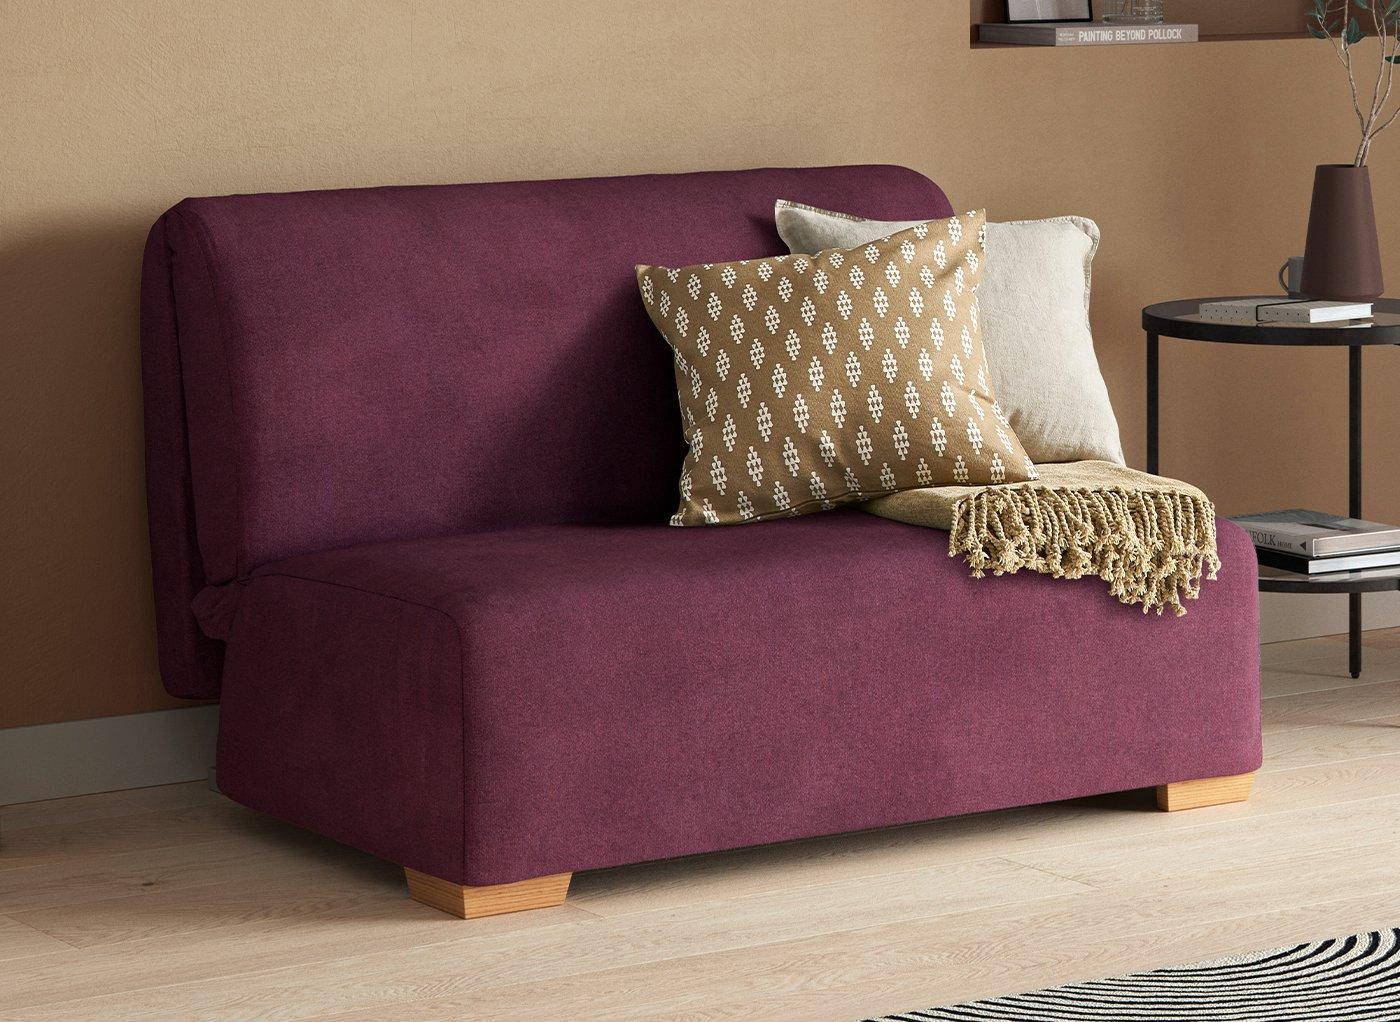 Cork 1 Seater A-Frame Sofa Bed - Plum Single PURPLE